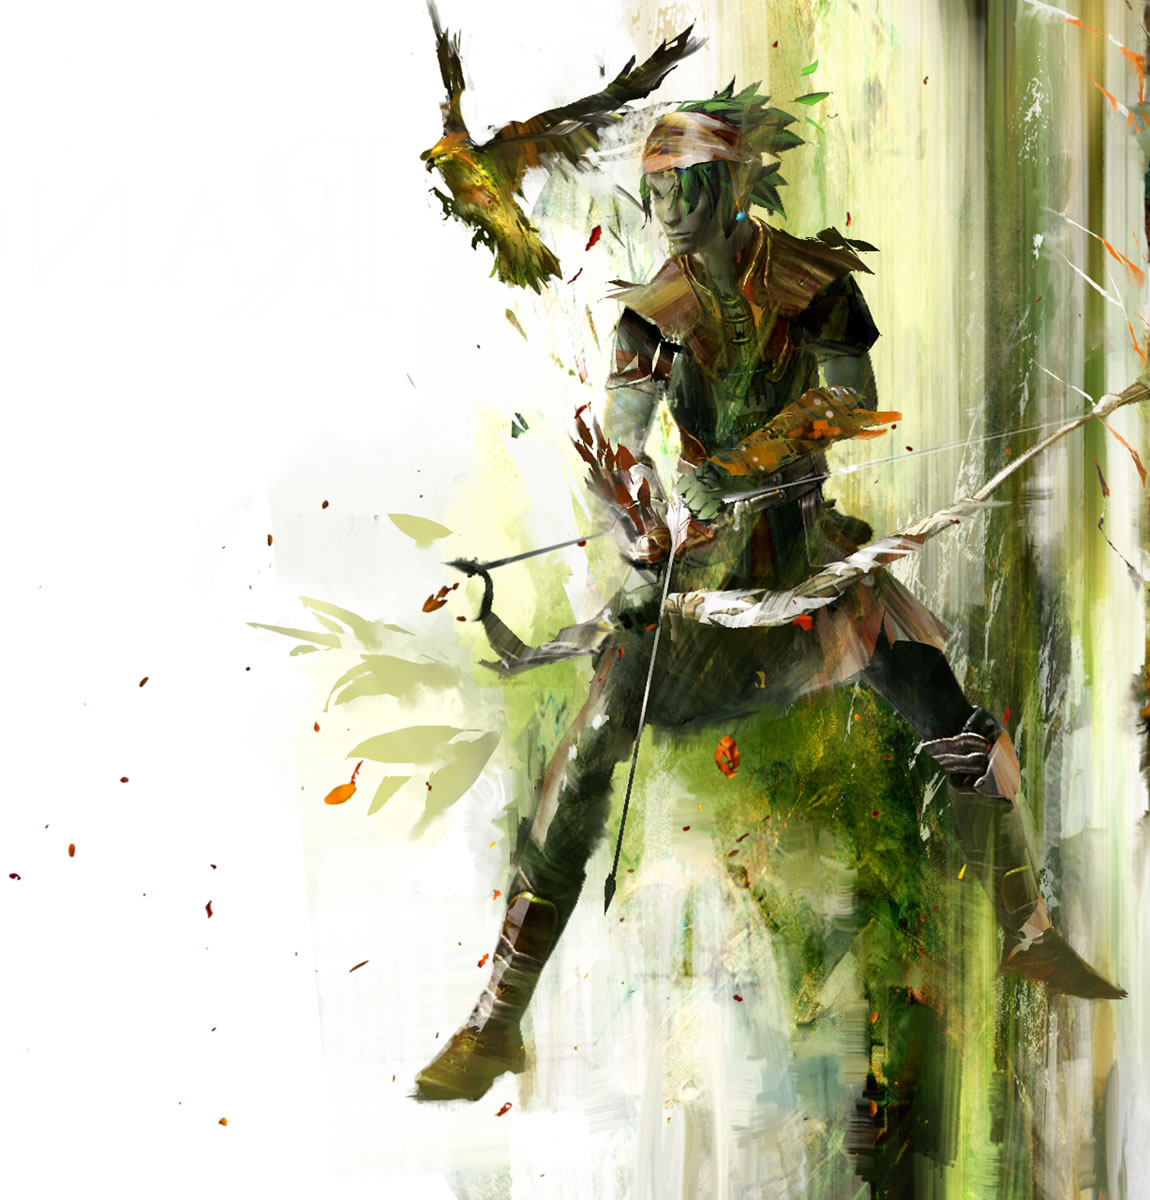 https://i1.wp.com/wiki.guildwars2.com/images/b/b7/Ranger_02_concept_art.jpg